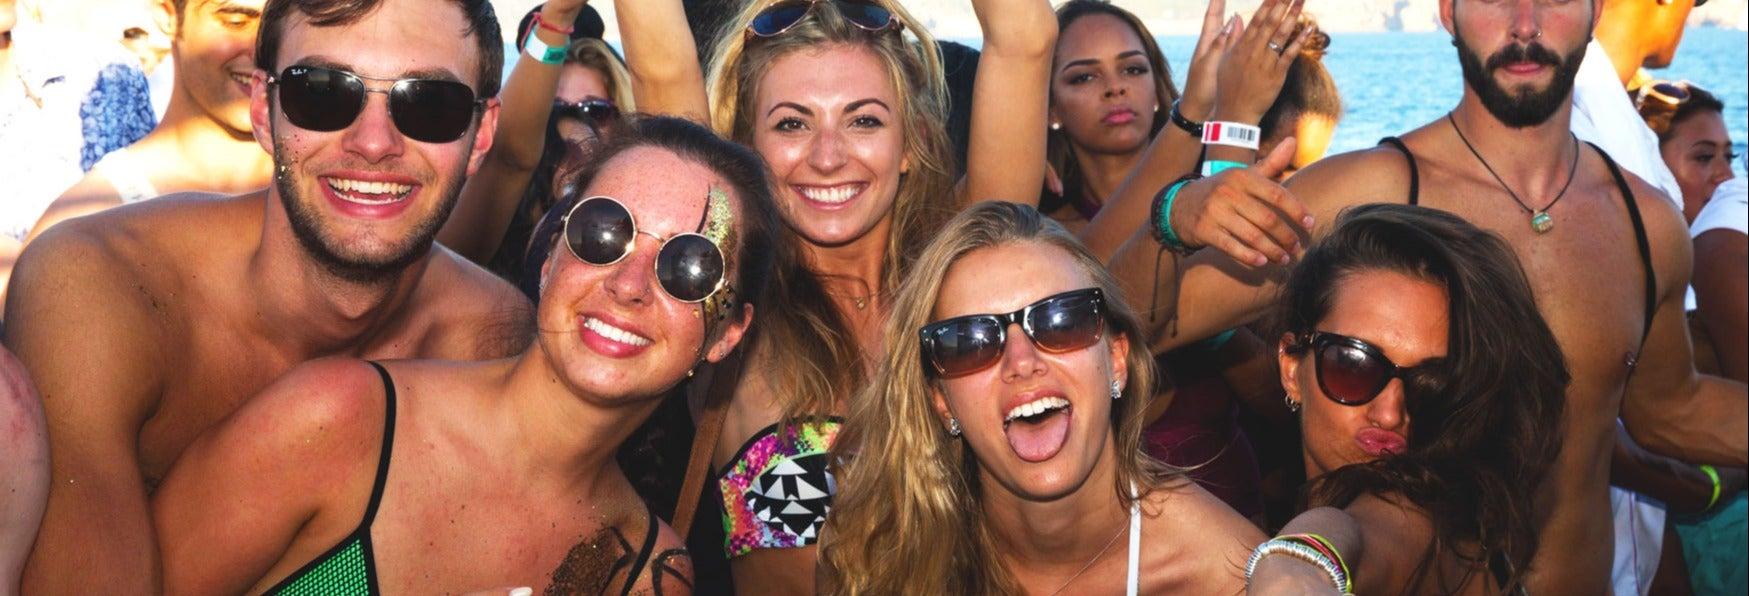 Festa Float Your Boat